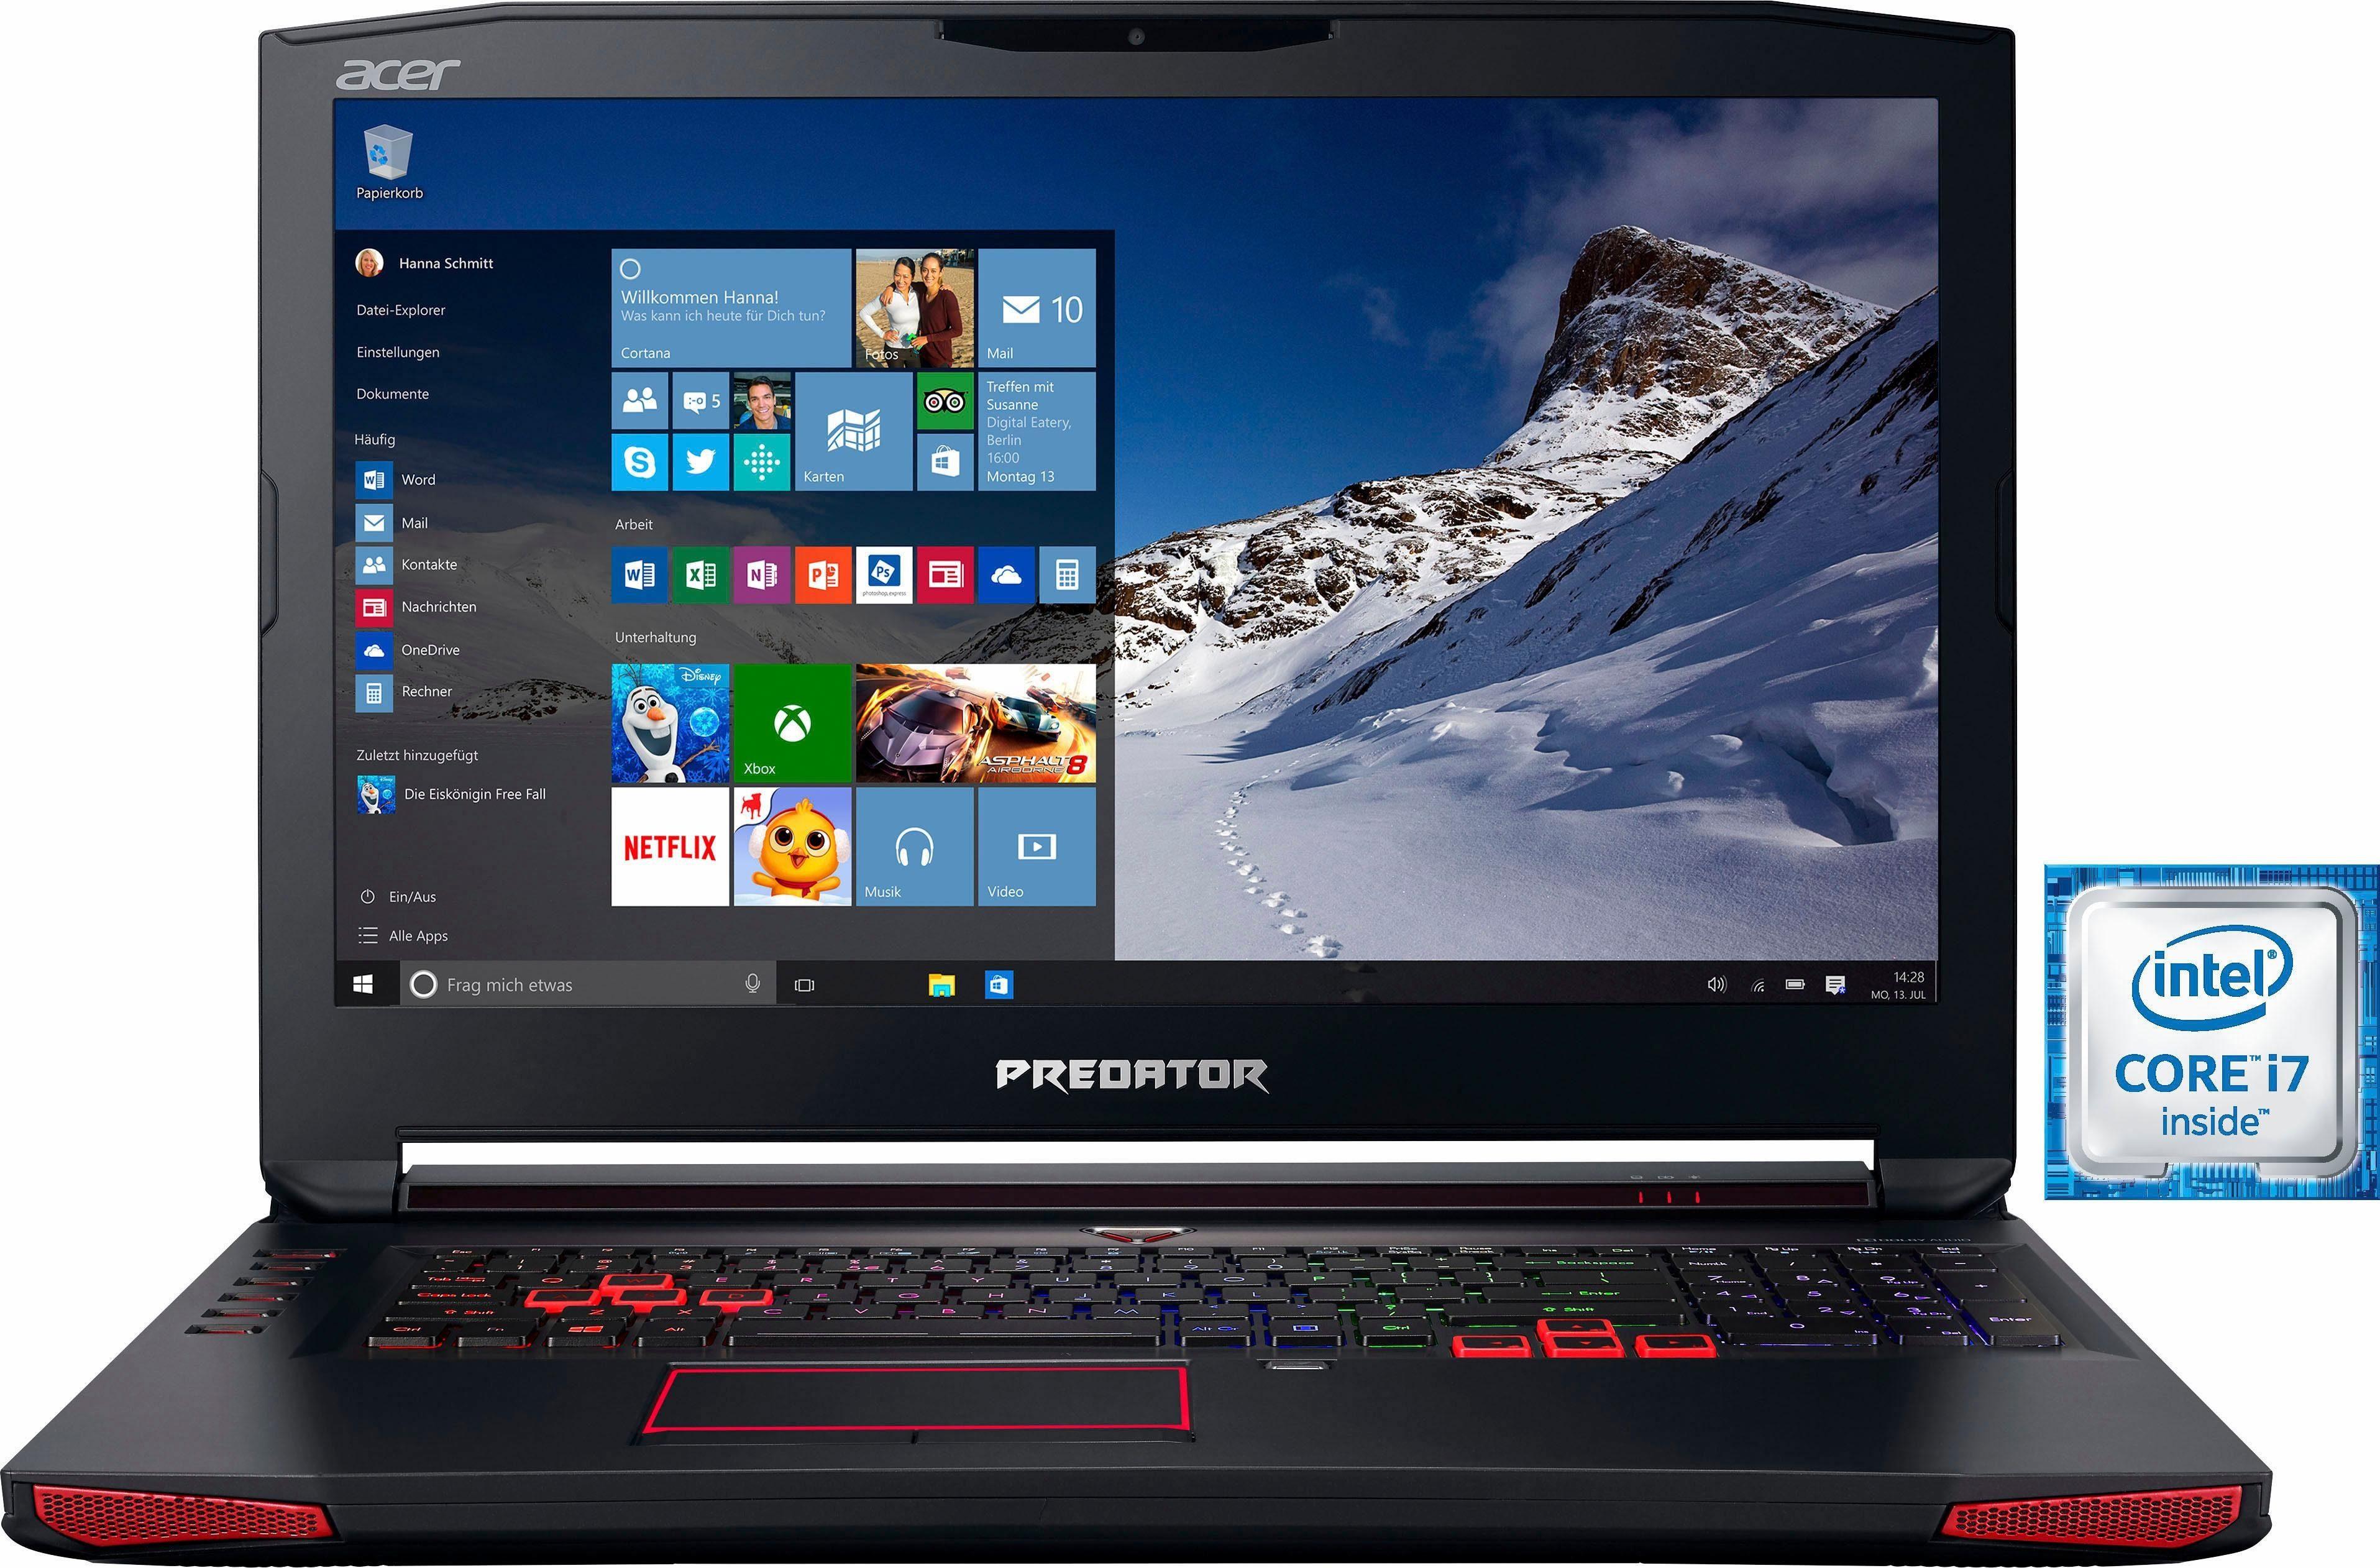 Acer Predator 17 (G9-793-731R) Notebook, Intel® Core™ i7, 43,9 cm (17,3 Zoll), 1256 GB Speicher